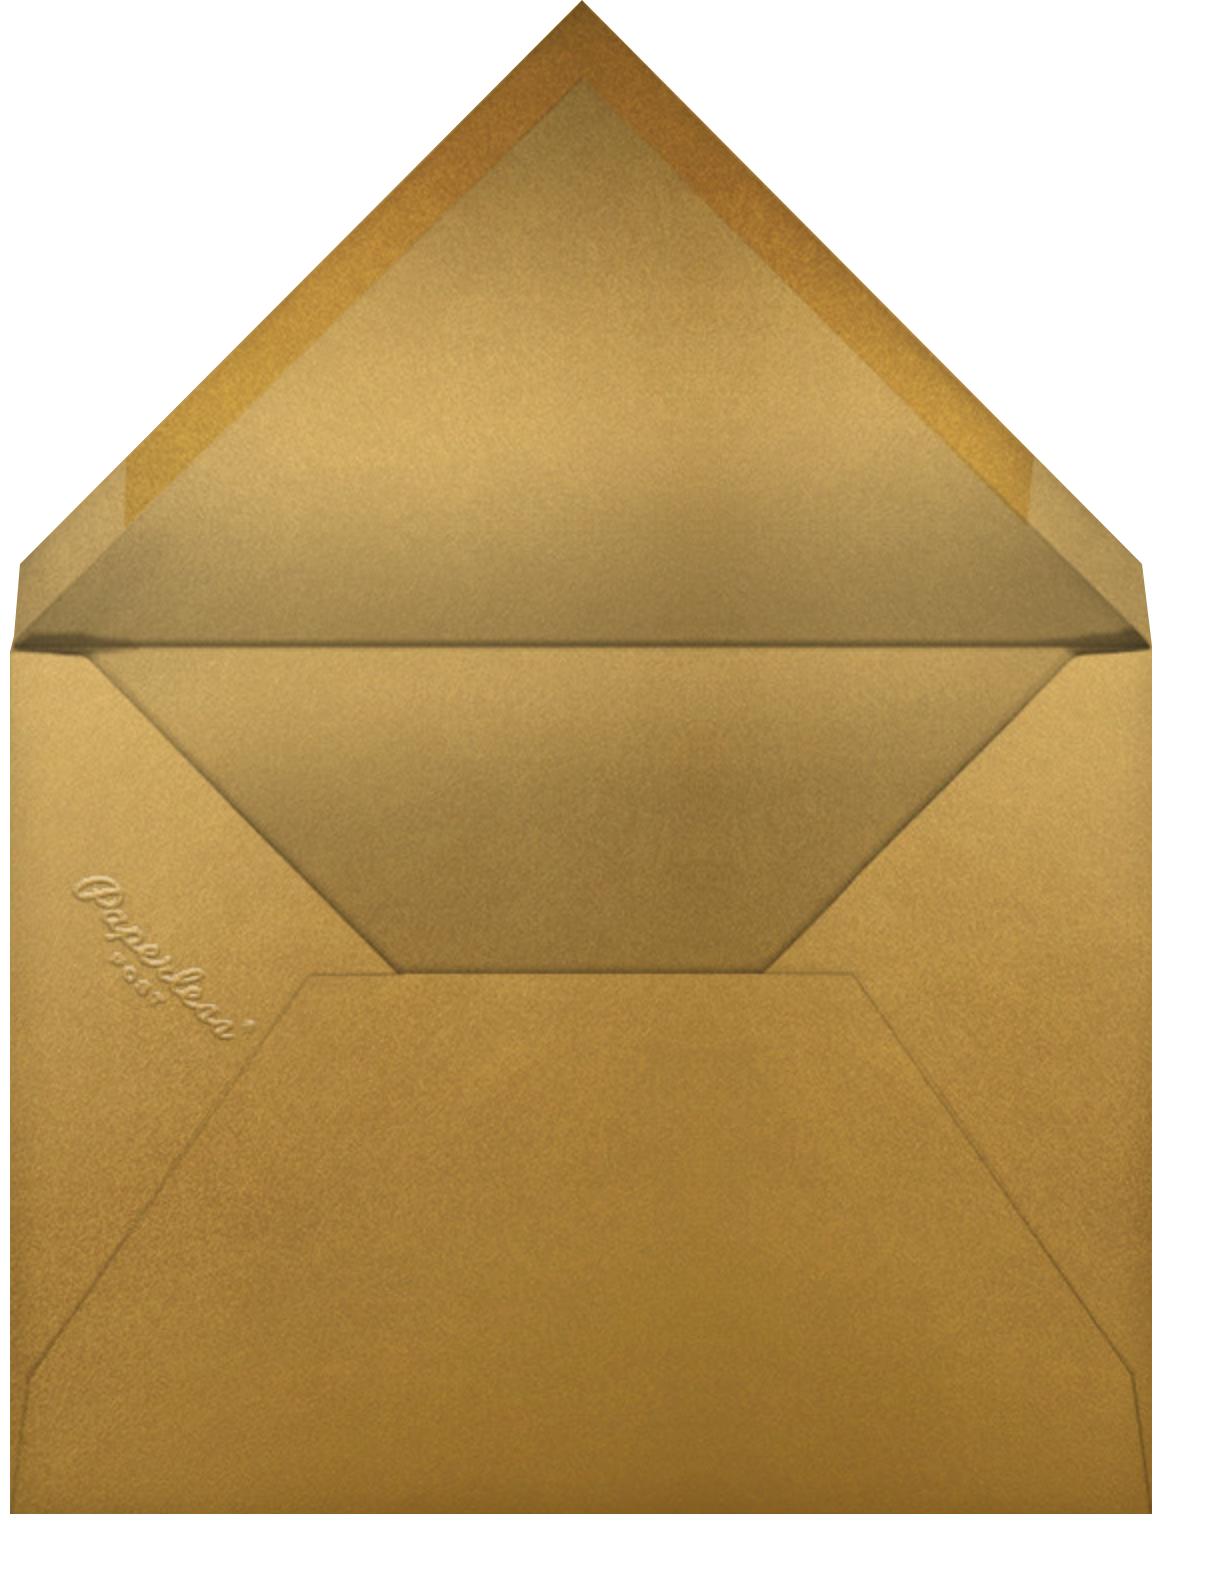 Knotwork Cream Square - Paperless Post - General entertaining - envelope back